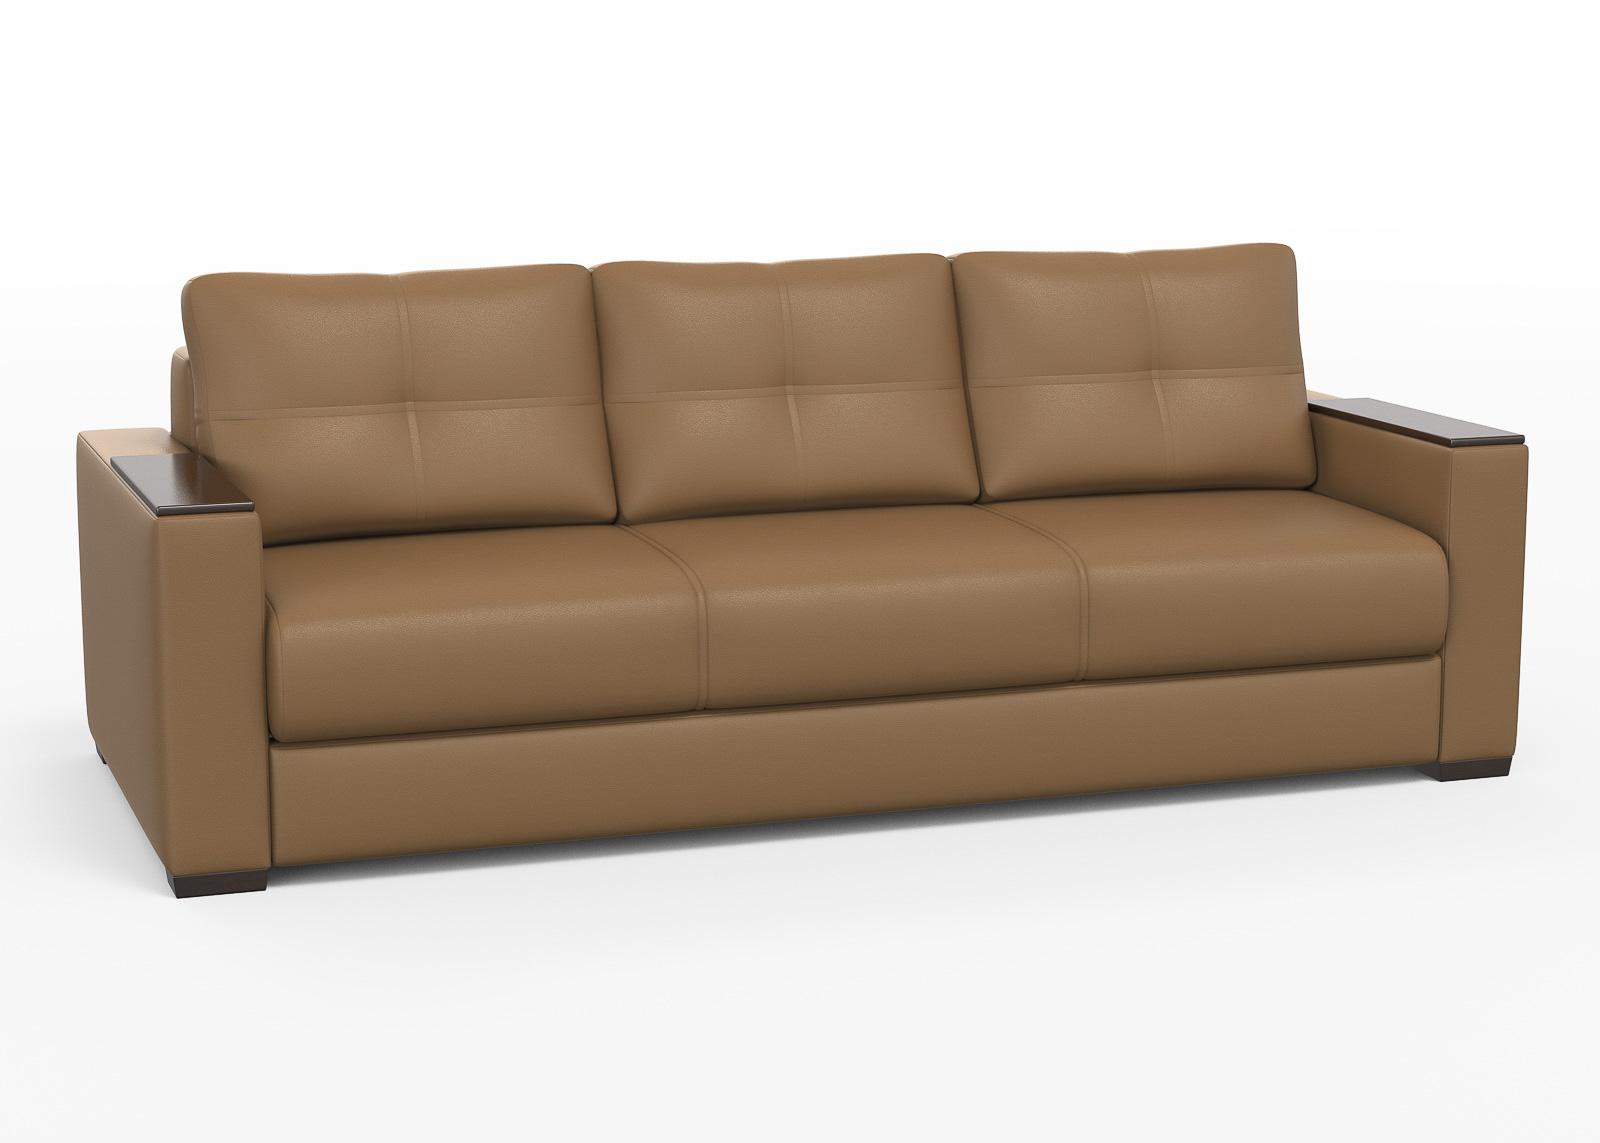 neo02 sofa